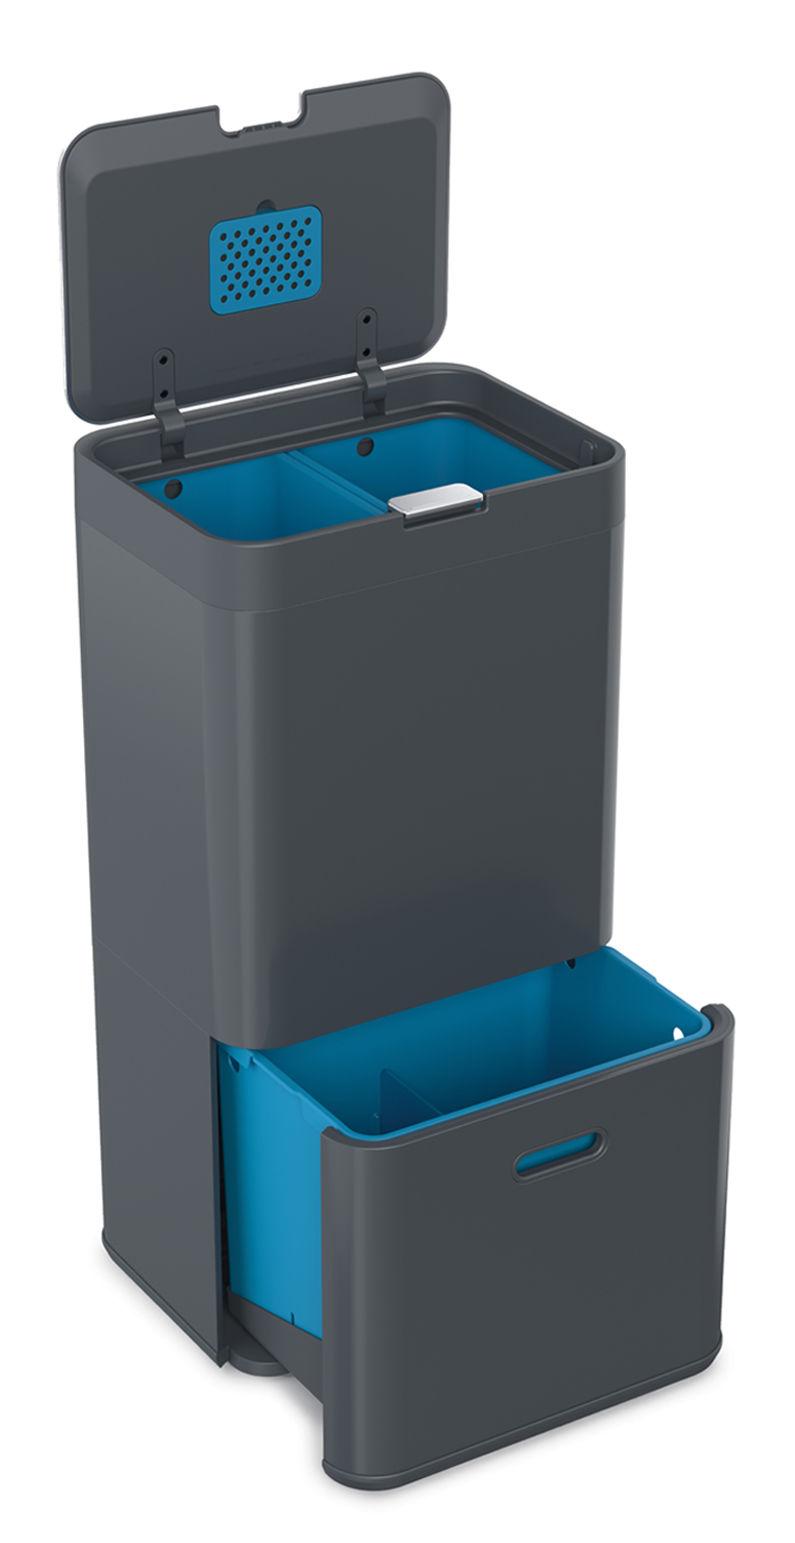 Küche - Mülleimer - Totem Abfallbehälter / 58 l - 4 Fächer - Joseph Joseph - Anthrazit - Plastikmaterial, Stahl